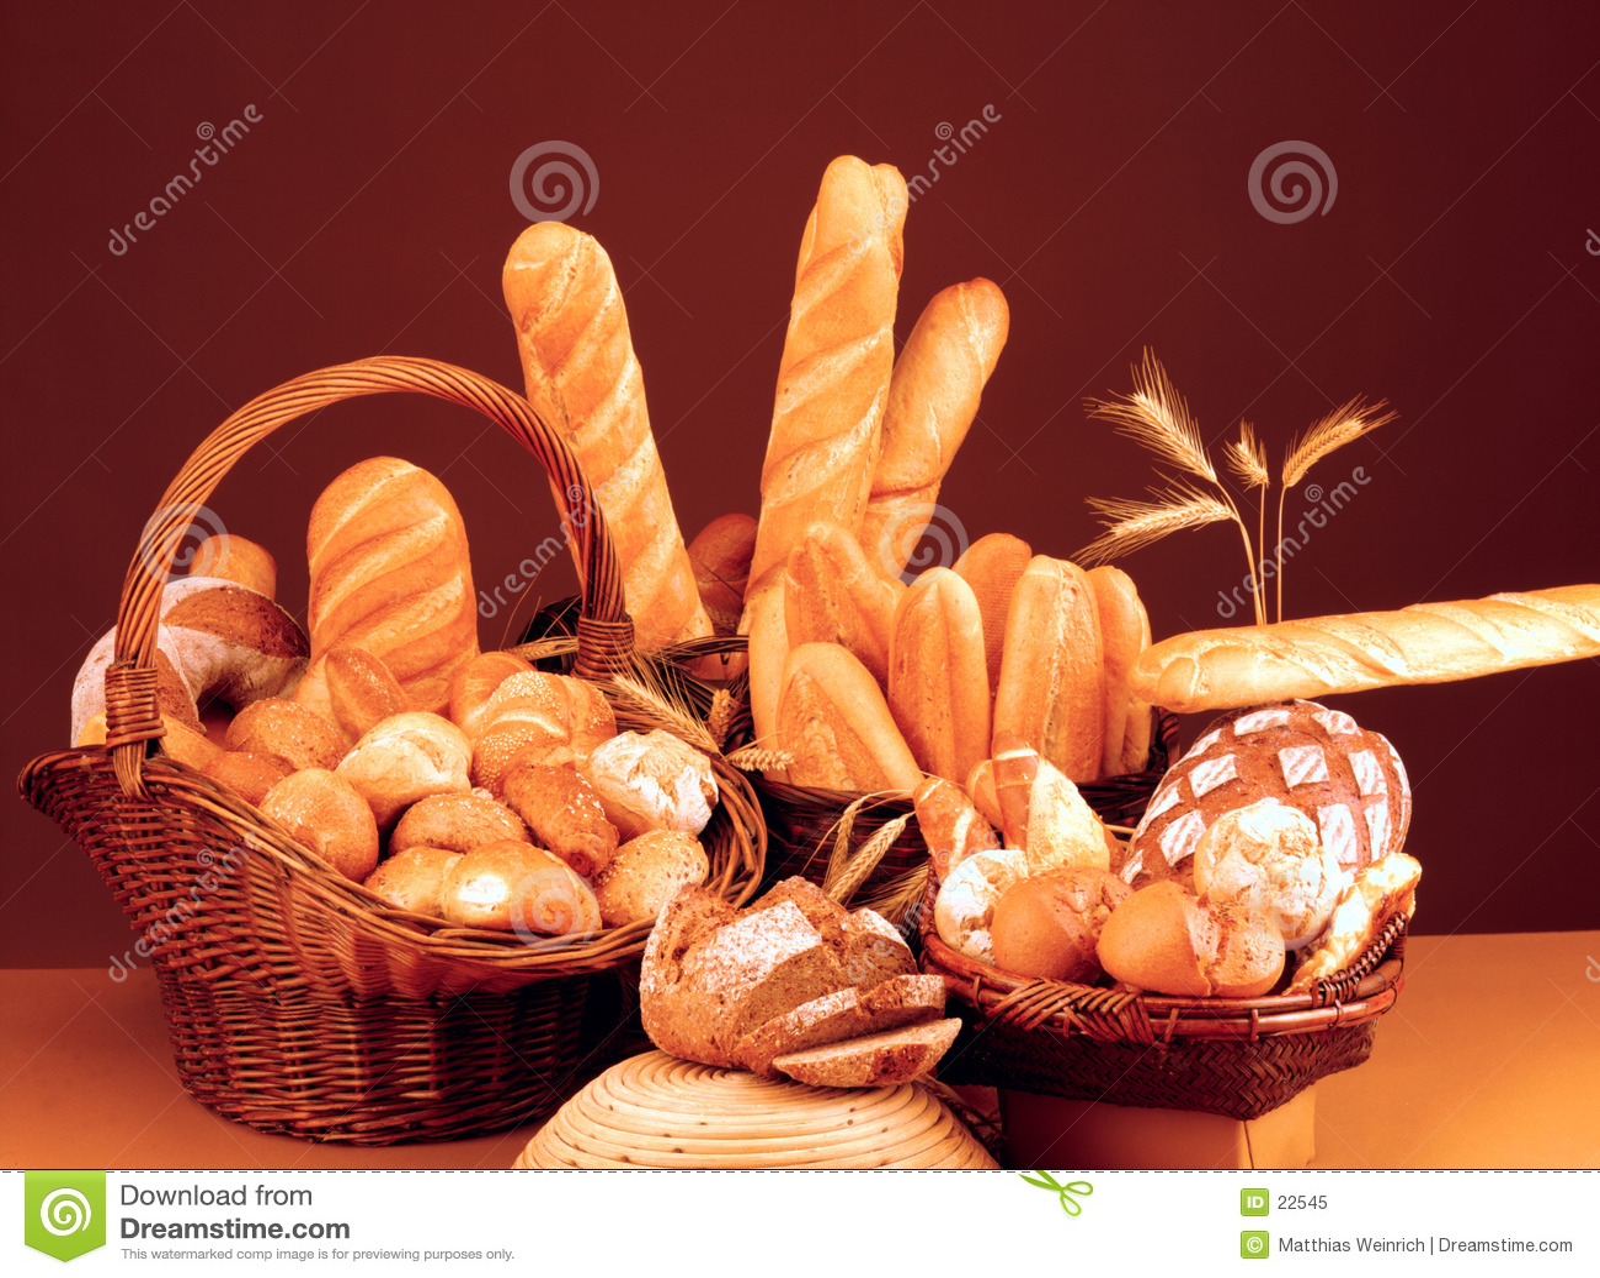 Stilleven met brood, broodjes en baguette